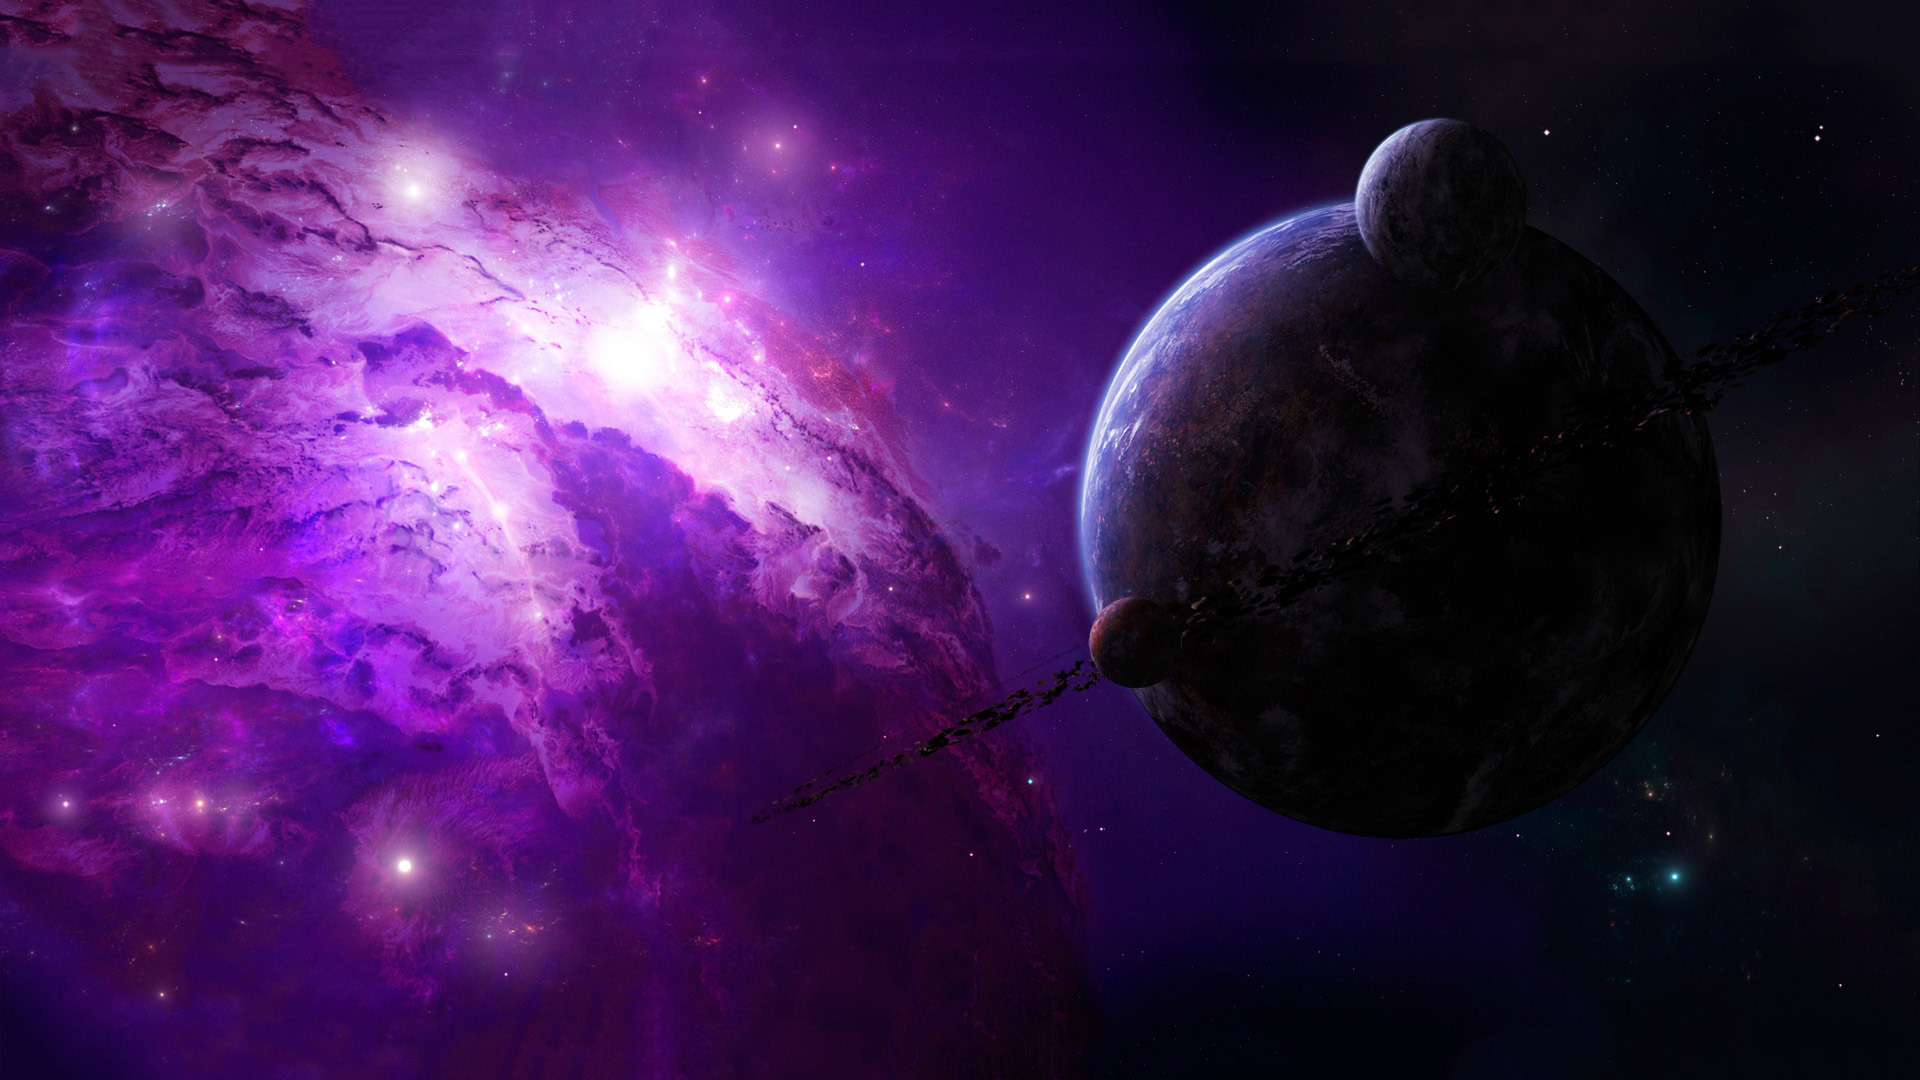 Download 1920x1080 HD Wallpaper planet violet nebula amazing 1920x1080